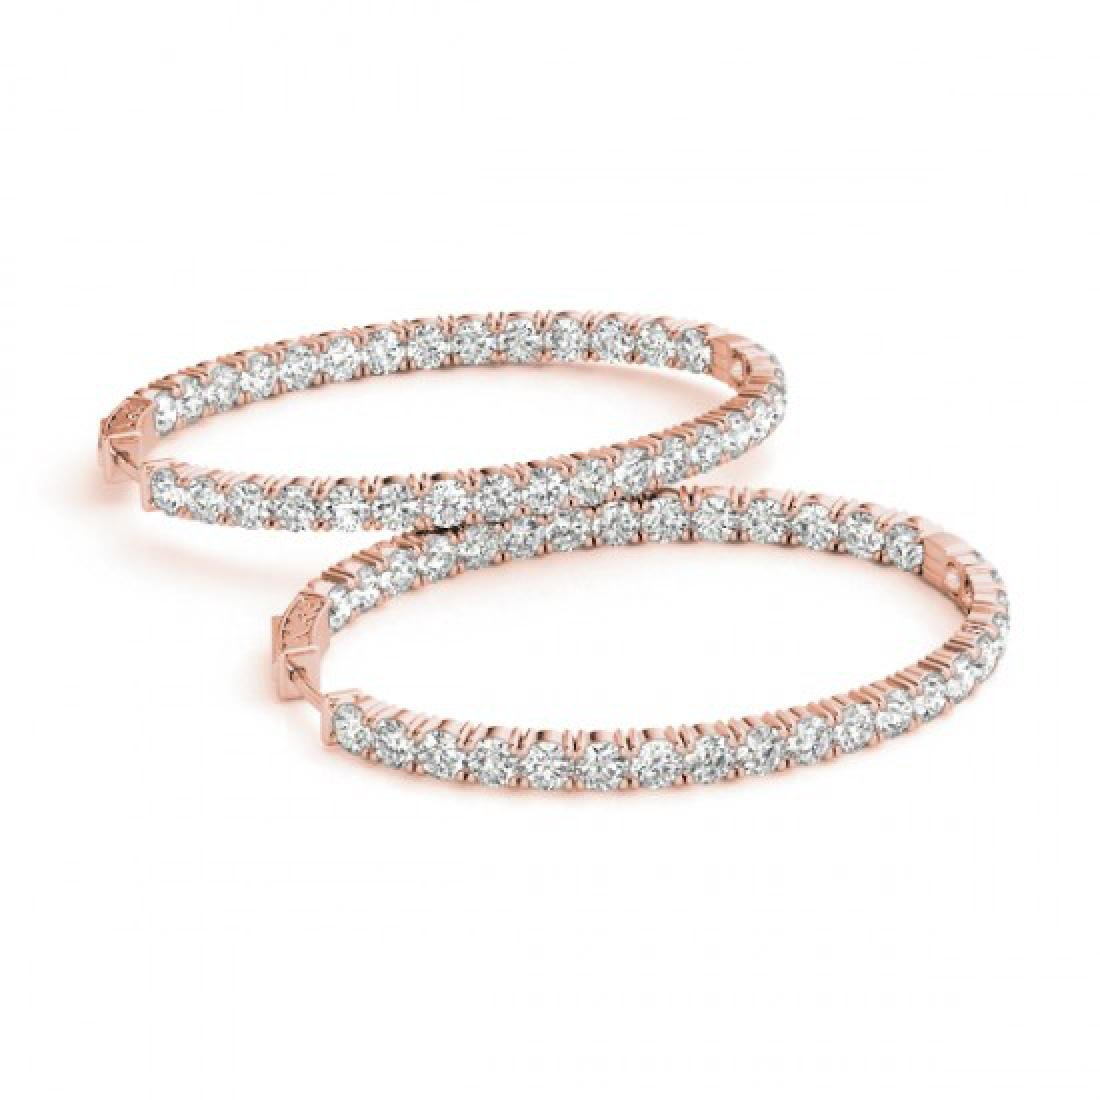 3 CTW Diamond VS/SI Certified 20 Mm Hoop Earrings 14K